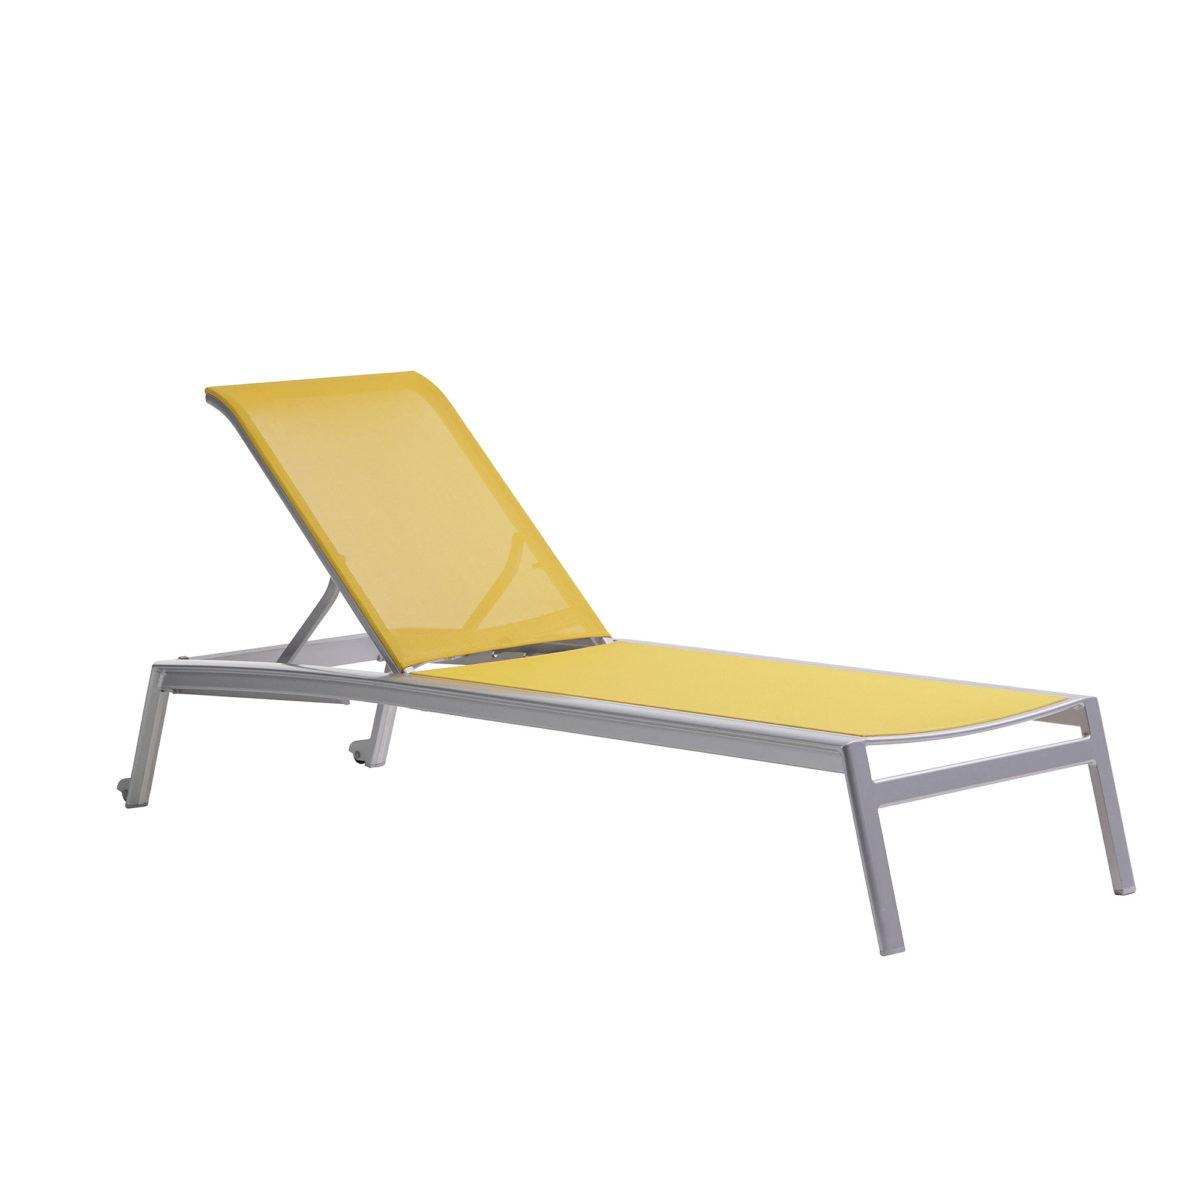 The Ratana Lyon adjustable lounger in solar yellow.